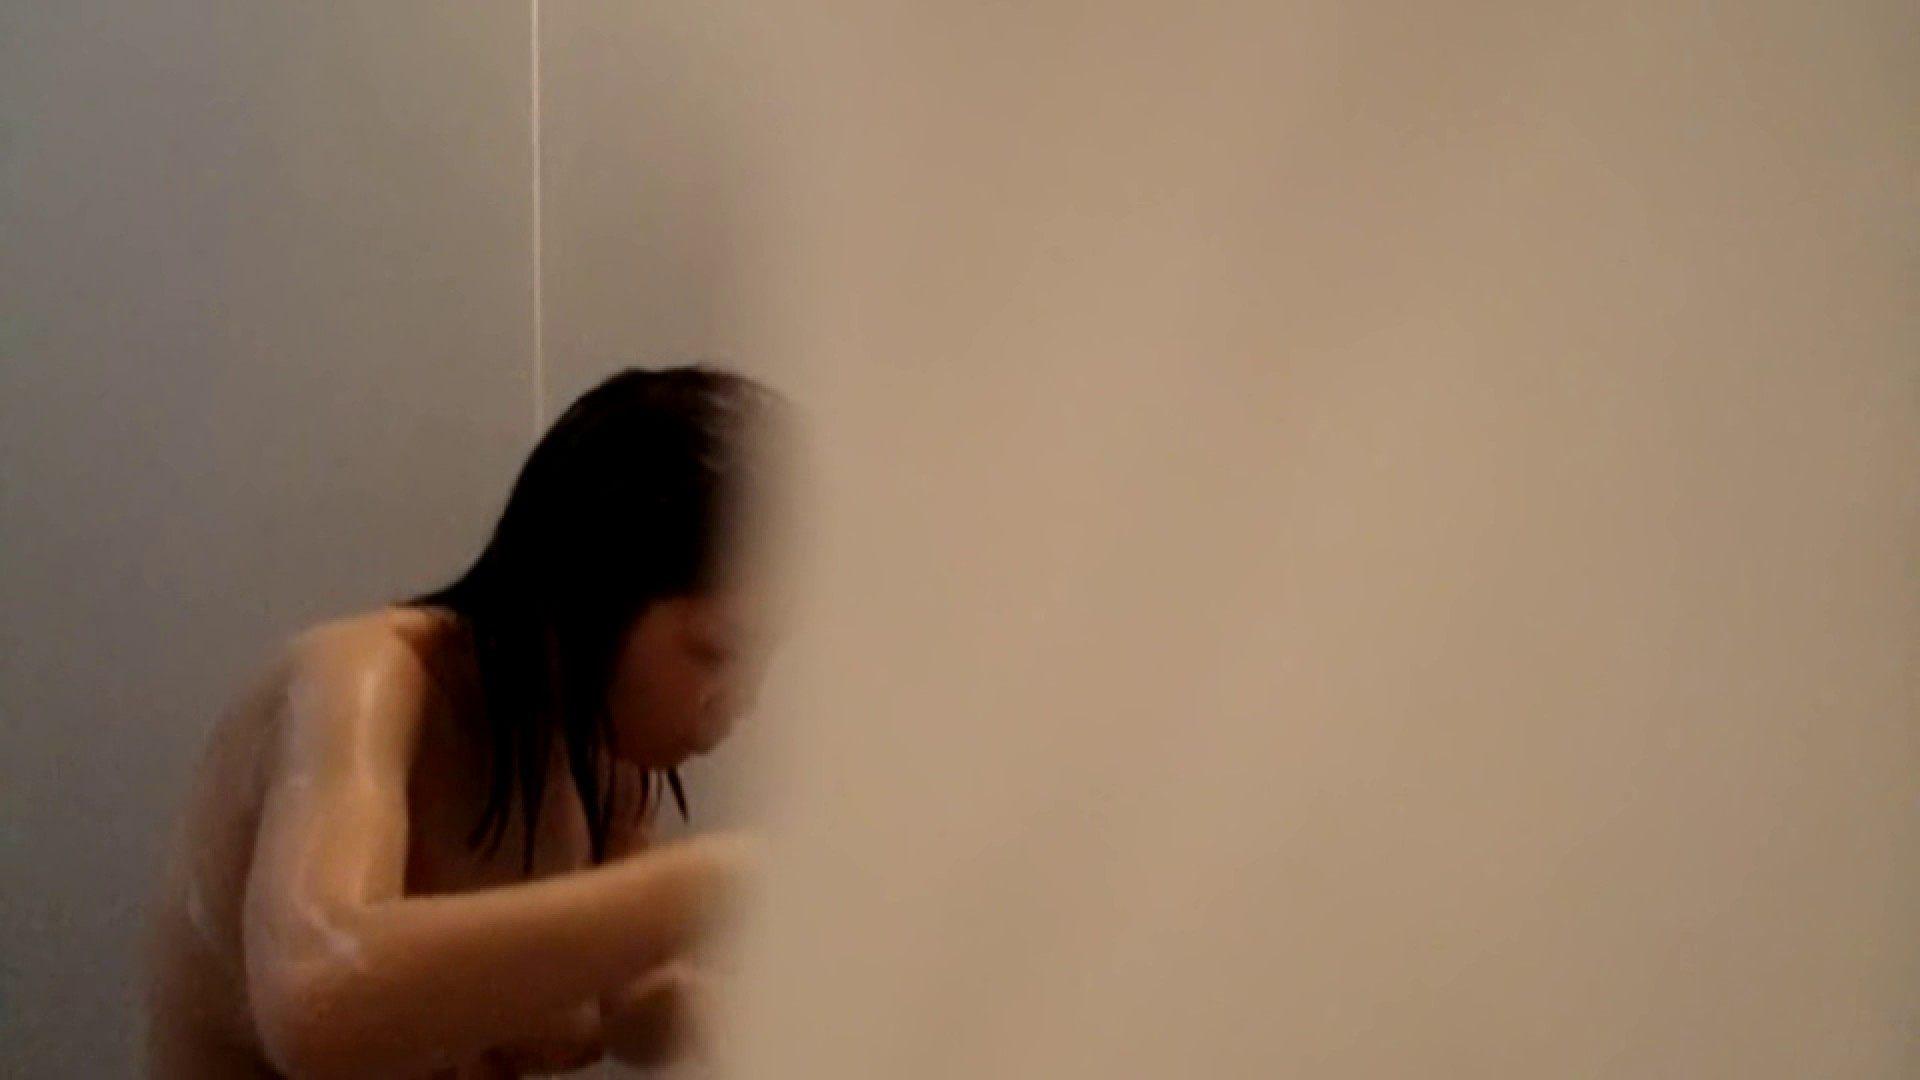 Vol.02 葵のグラドル顔負けの爆乳を入浴シーンでどうぞ。 OLのエロ生活  55連発 52